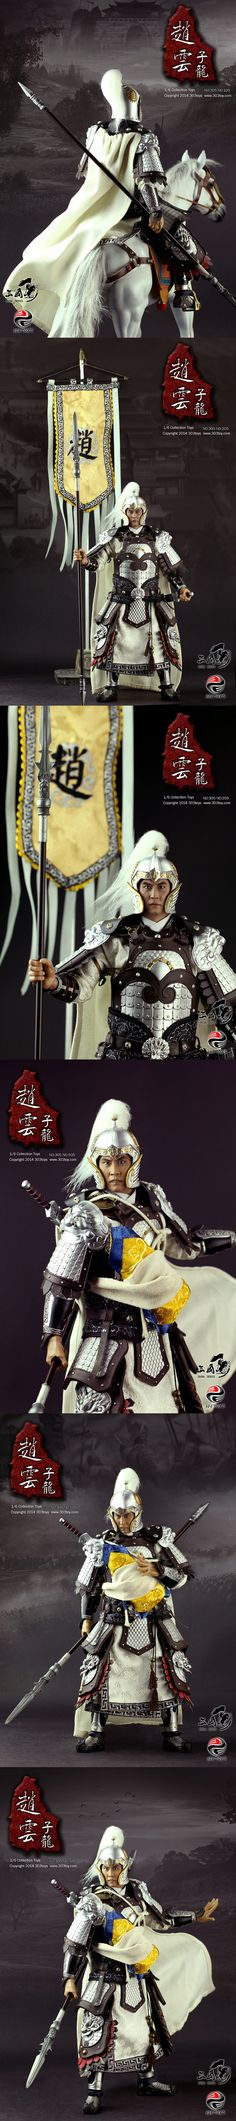 [303TOYS 1/6 China Series - Zhao Yun(Sub Dragon) Set]